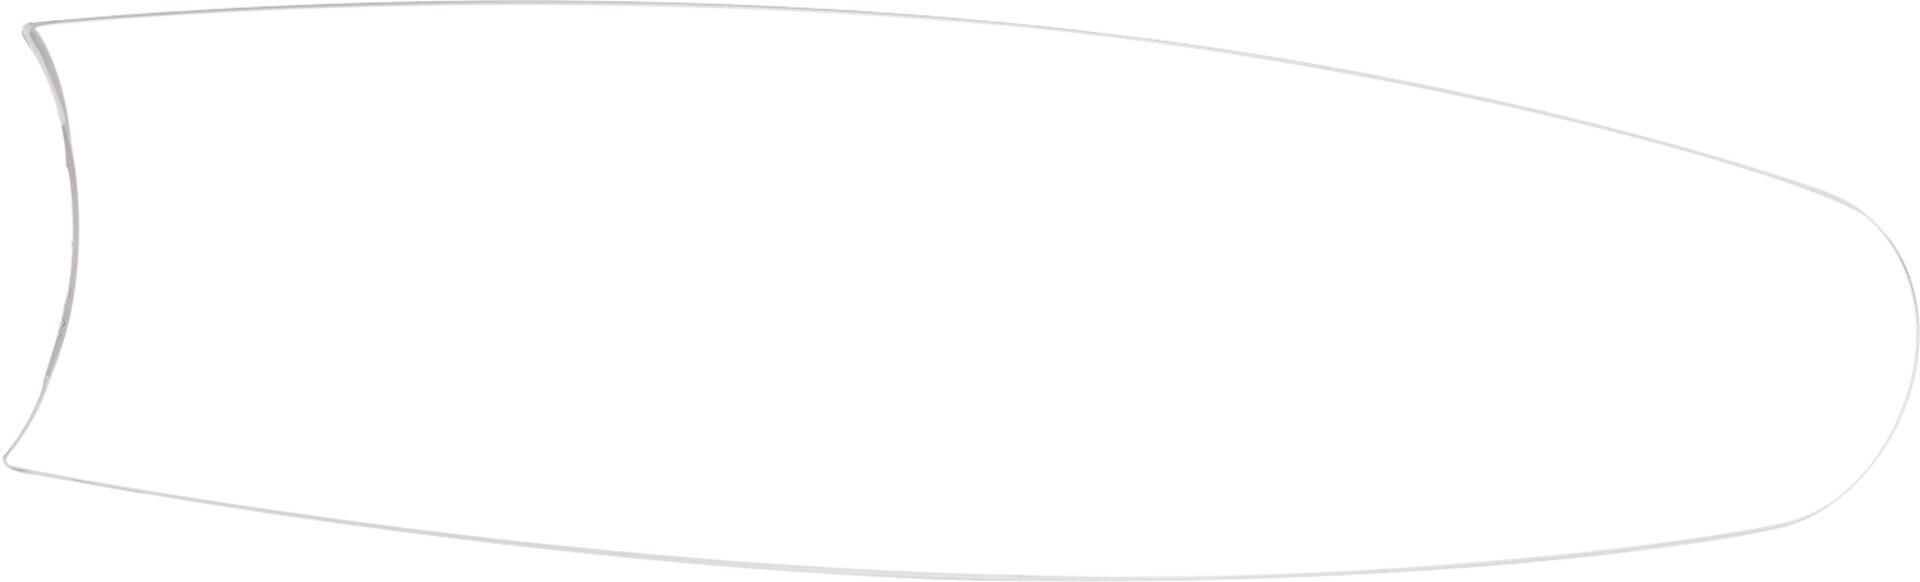 Deckenventilator PREMIER Globo Metall silber 132 x 43 x 132 cm